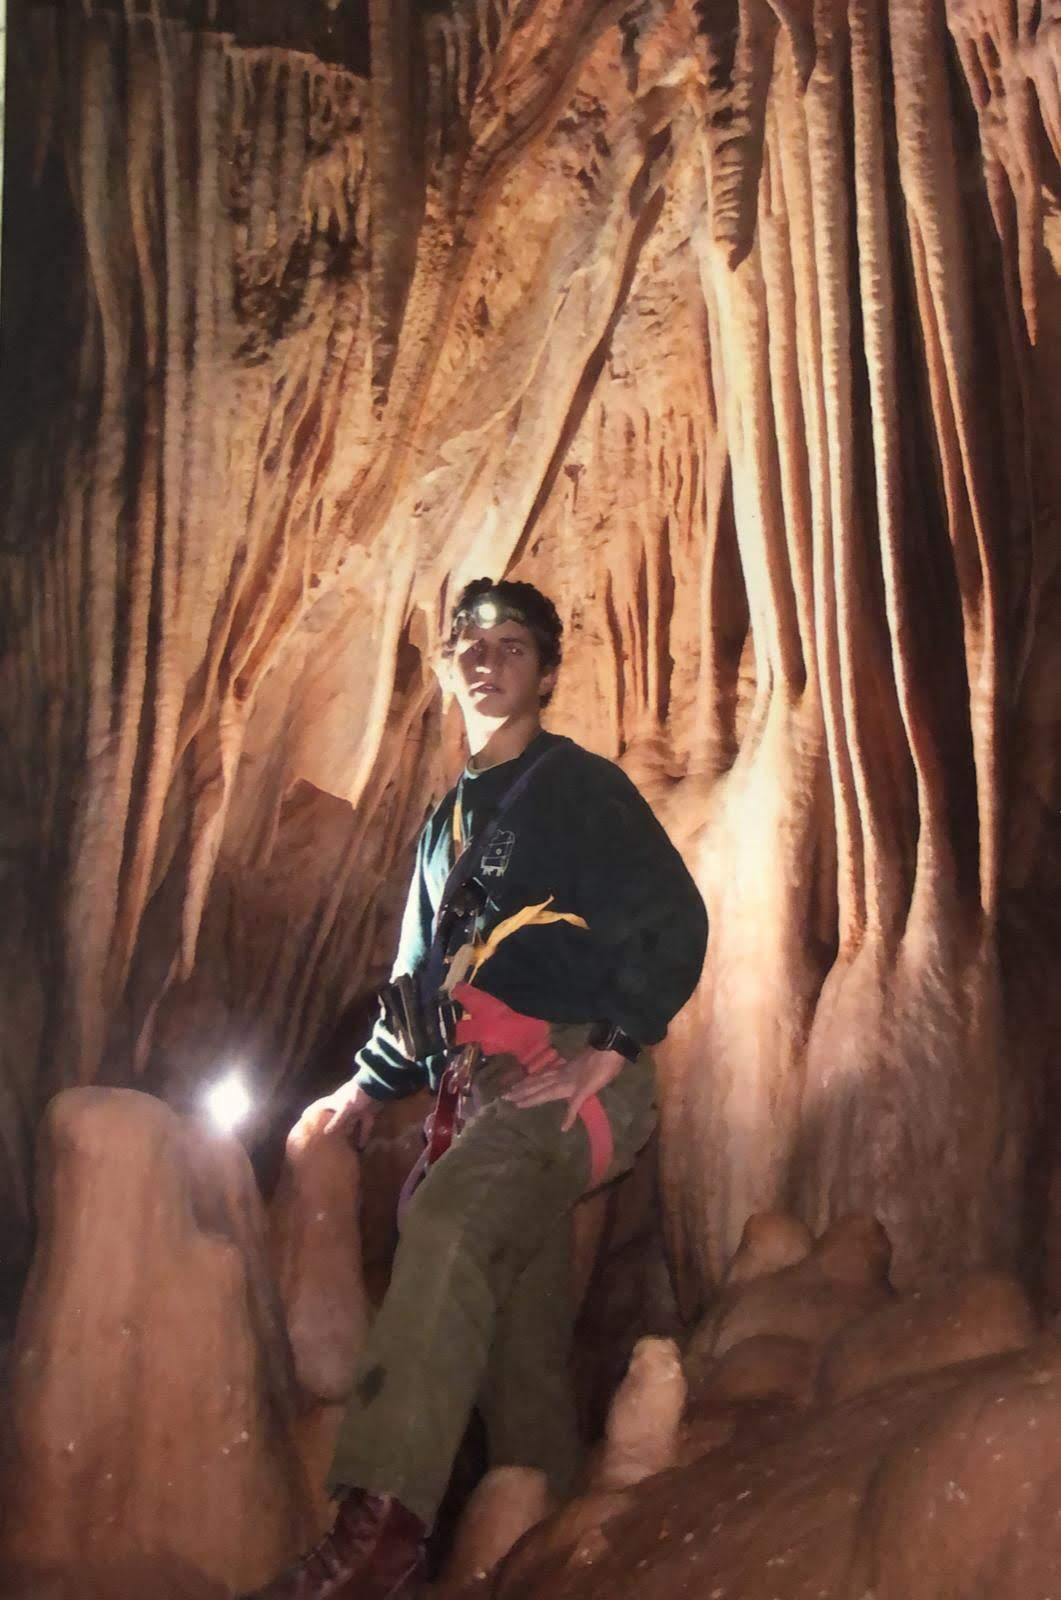 Cave photo contest 048